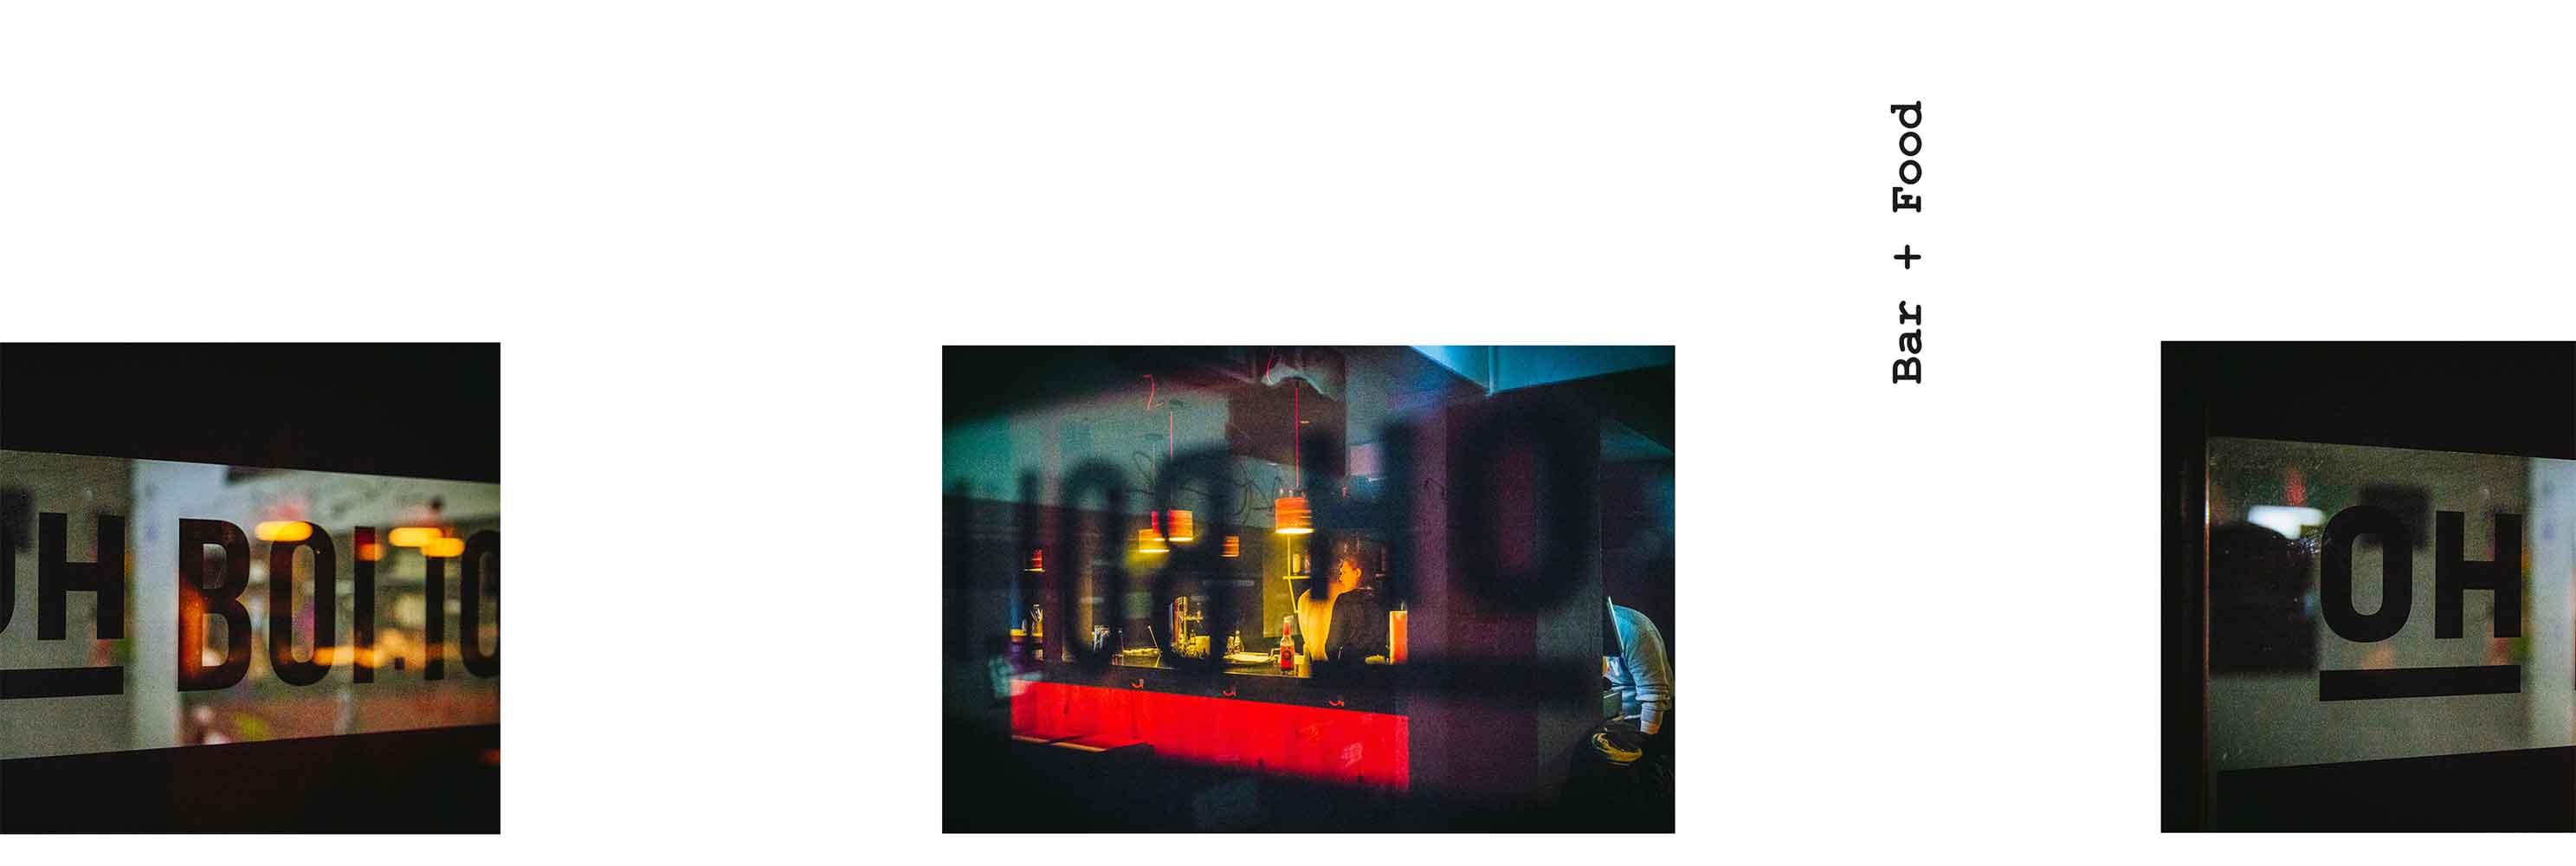 07-oh-boi-bar-food-augsburg-branding-design-window-interieur